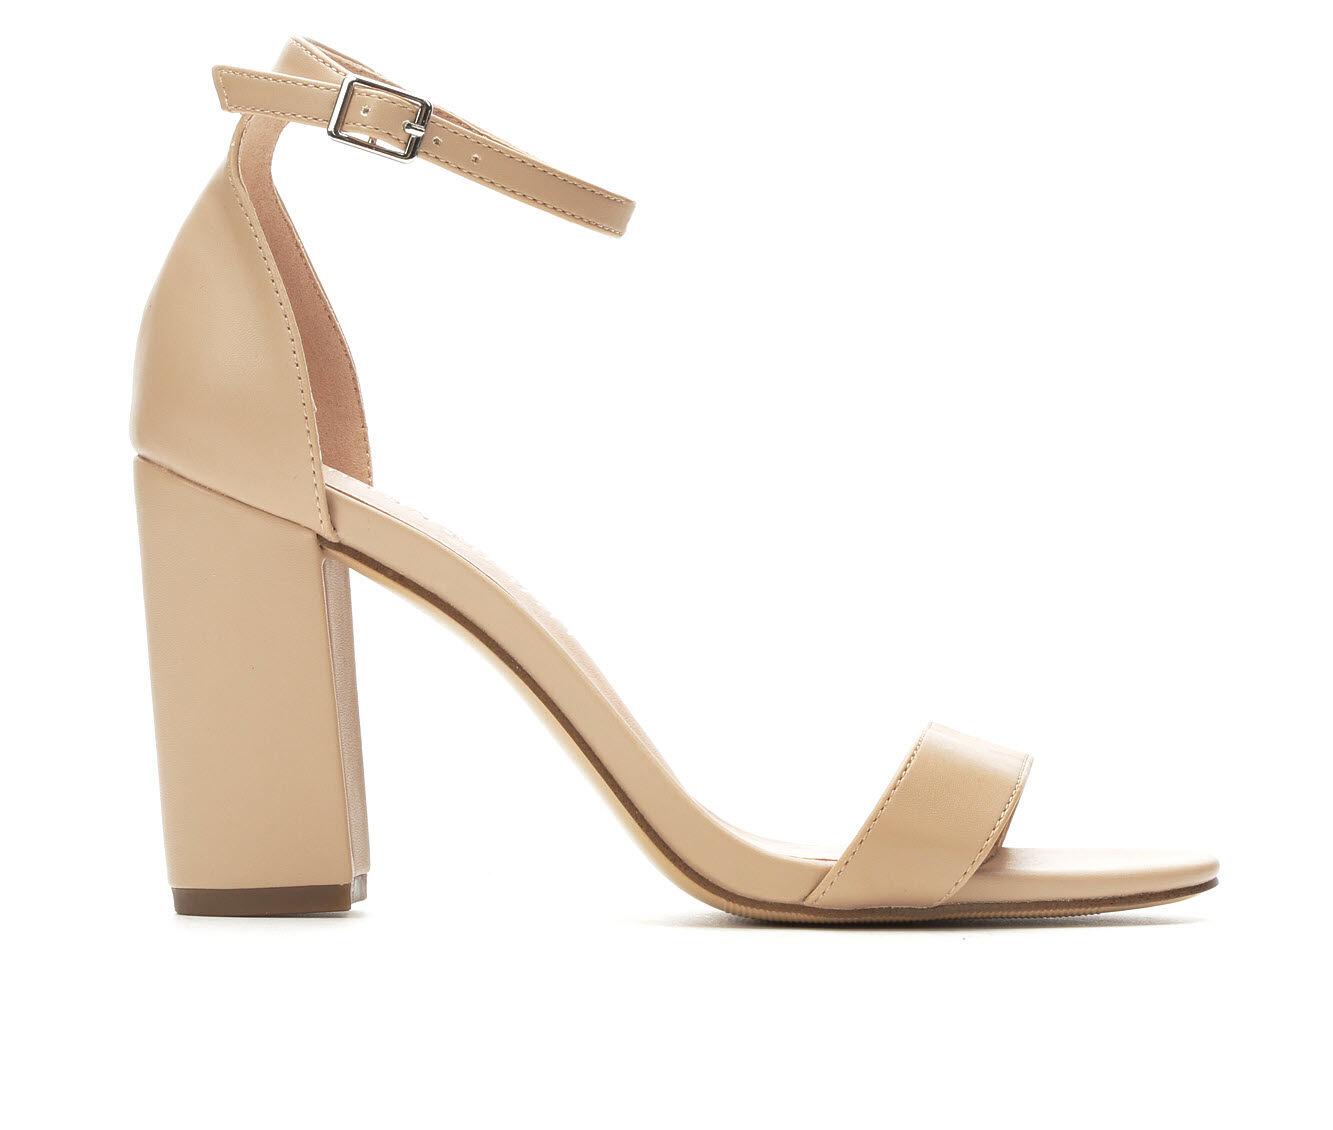 choose authentic Women's Madden Girl Beella Heeled Sandals Blush Smooth